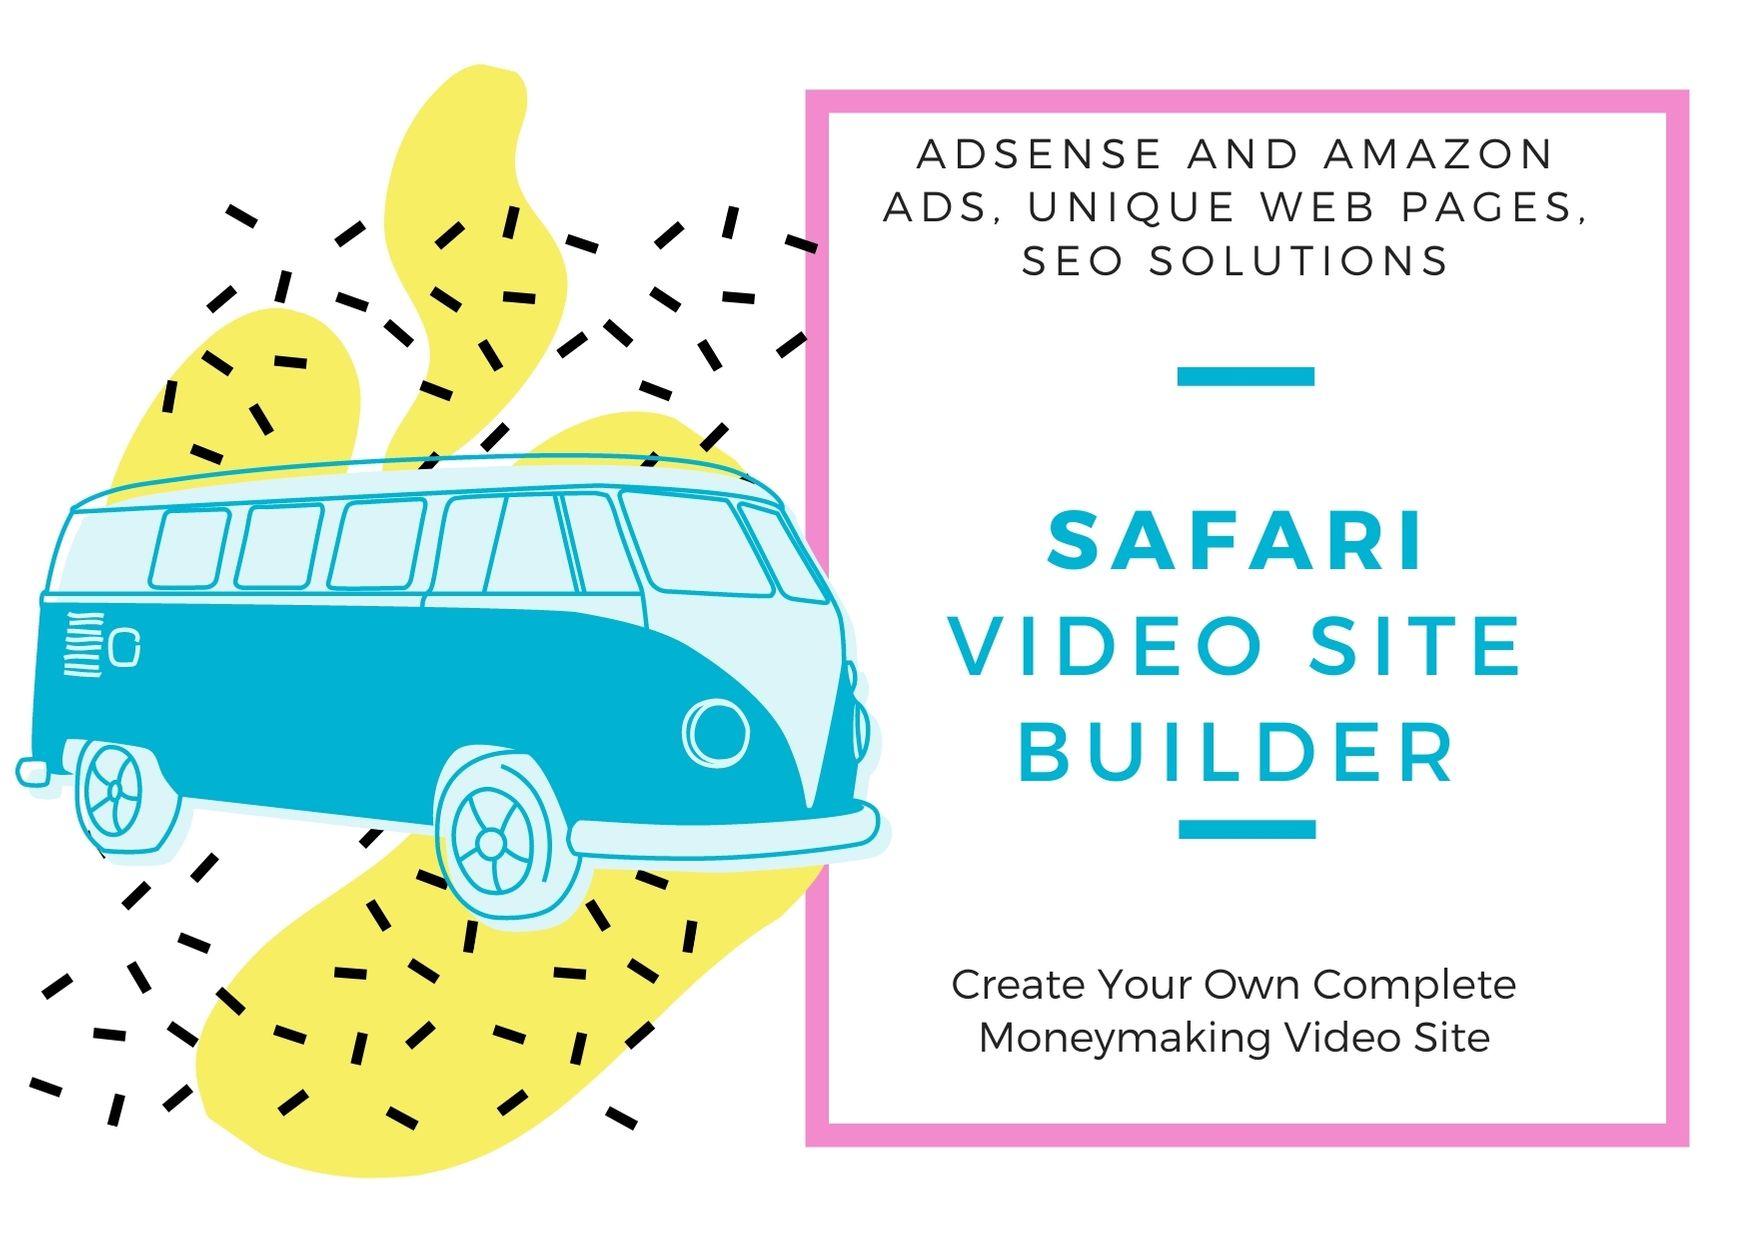 Safari Video Site Builder, create your own money making site